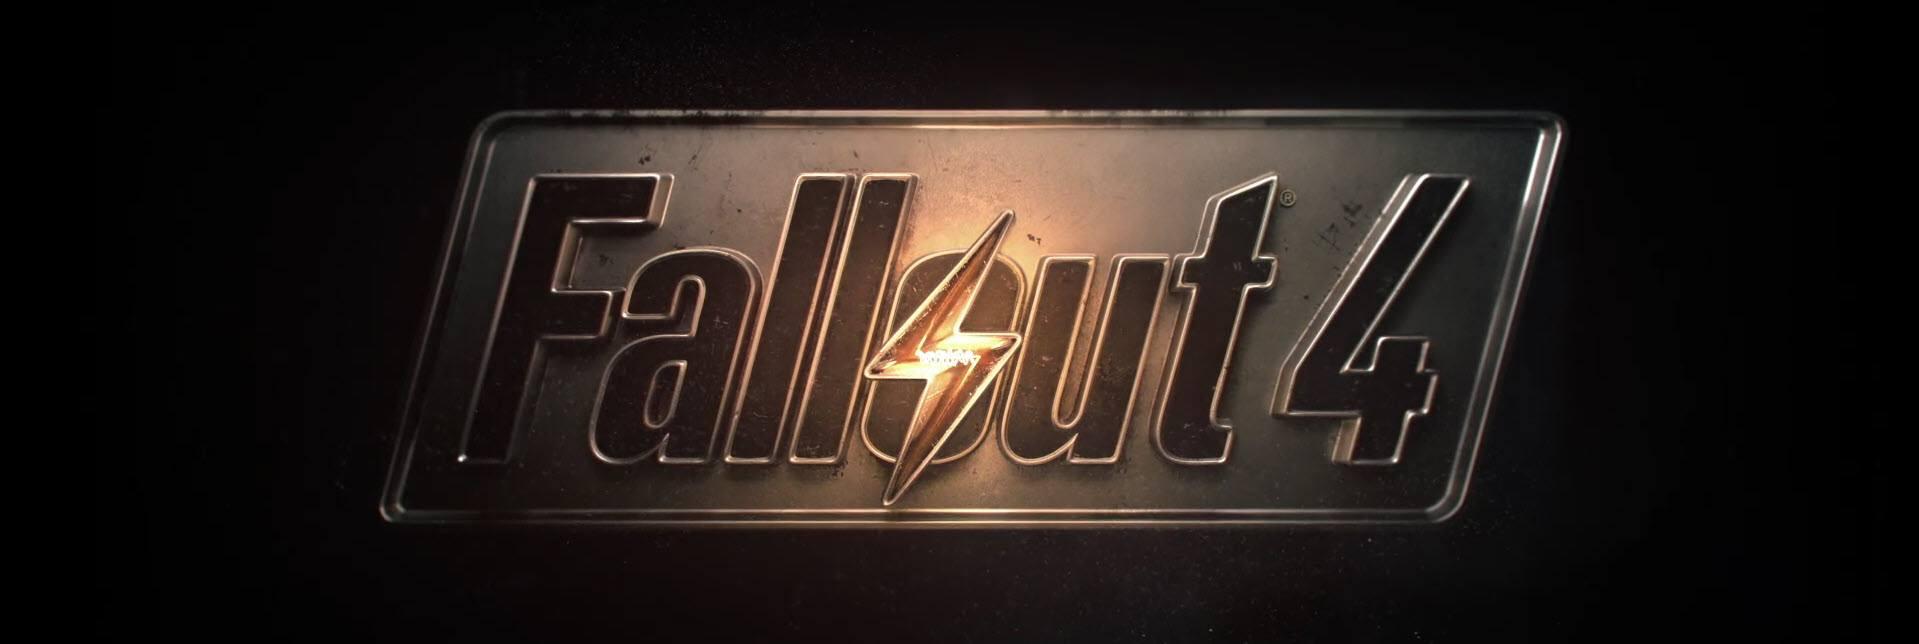 Fallout 4 1.10 64 Update